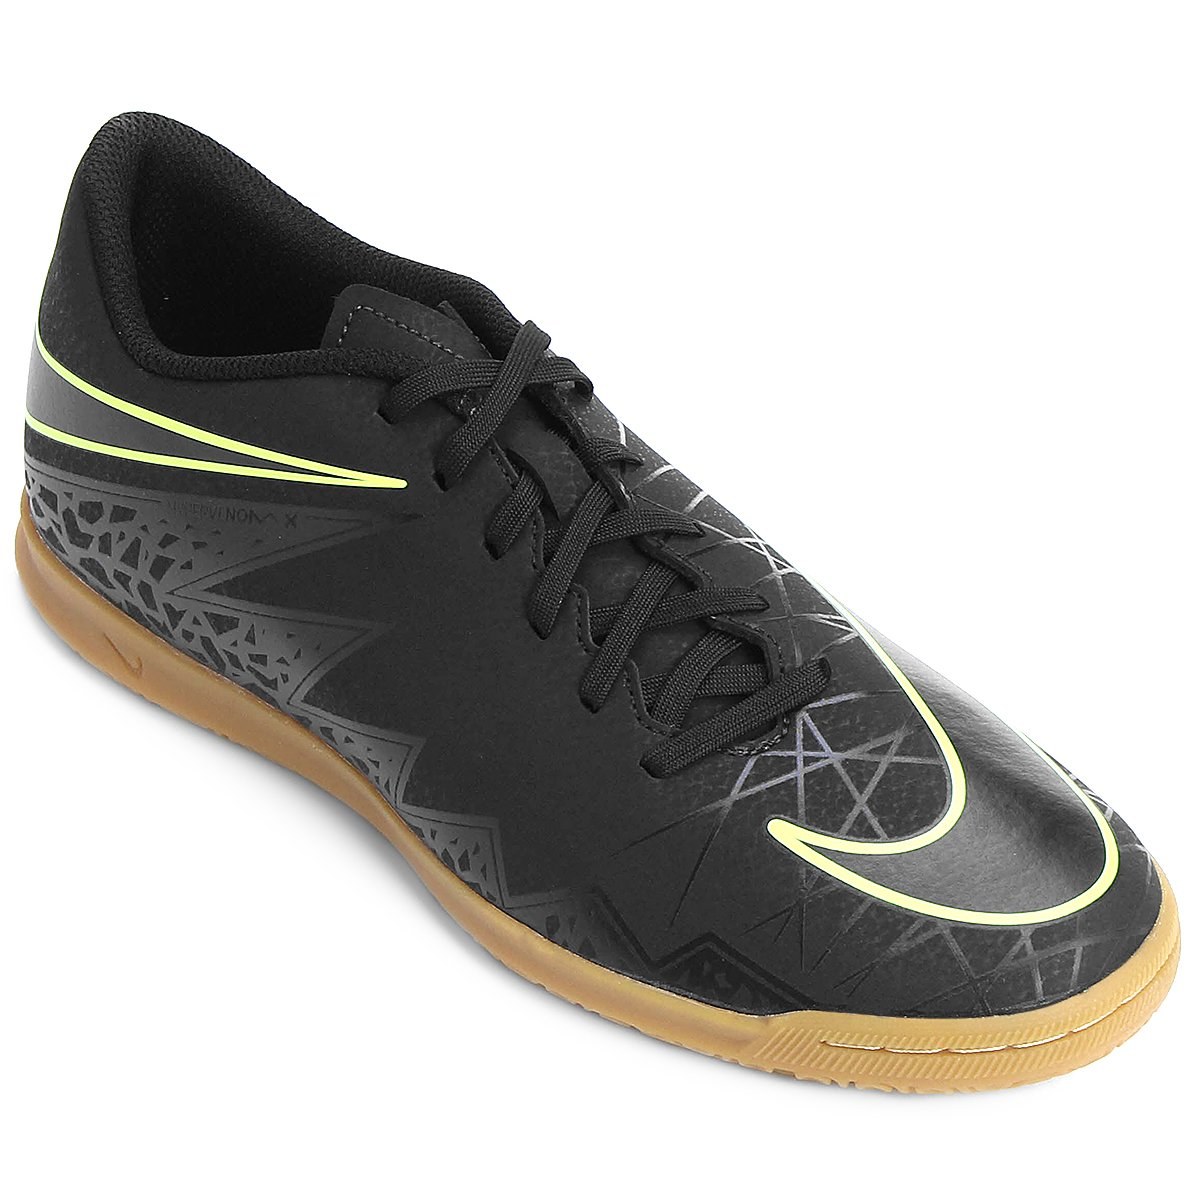 ... ireland chuteira futsal nike hypervenom phade 2 ic masculina compre  agora netshoes f9562 8fe4f e6aab7ff0fe3a